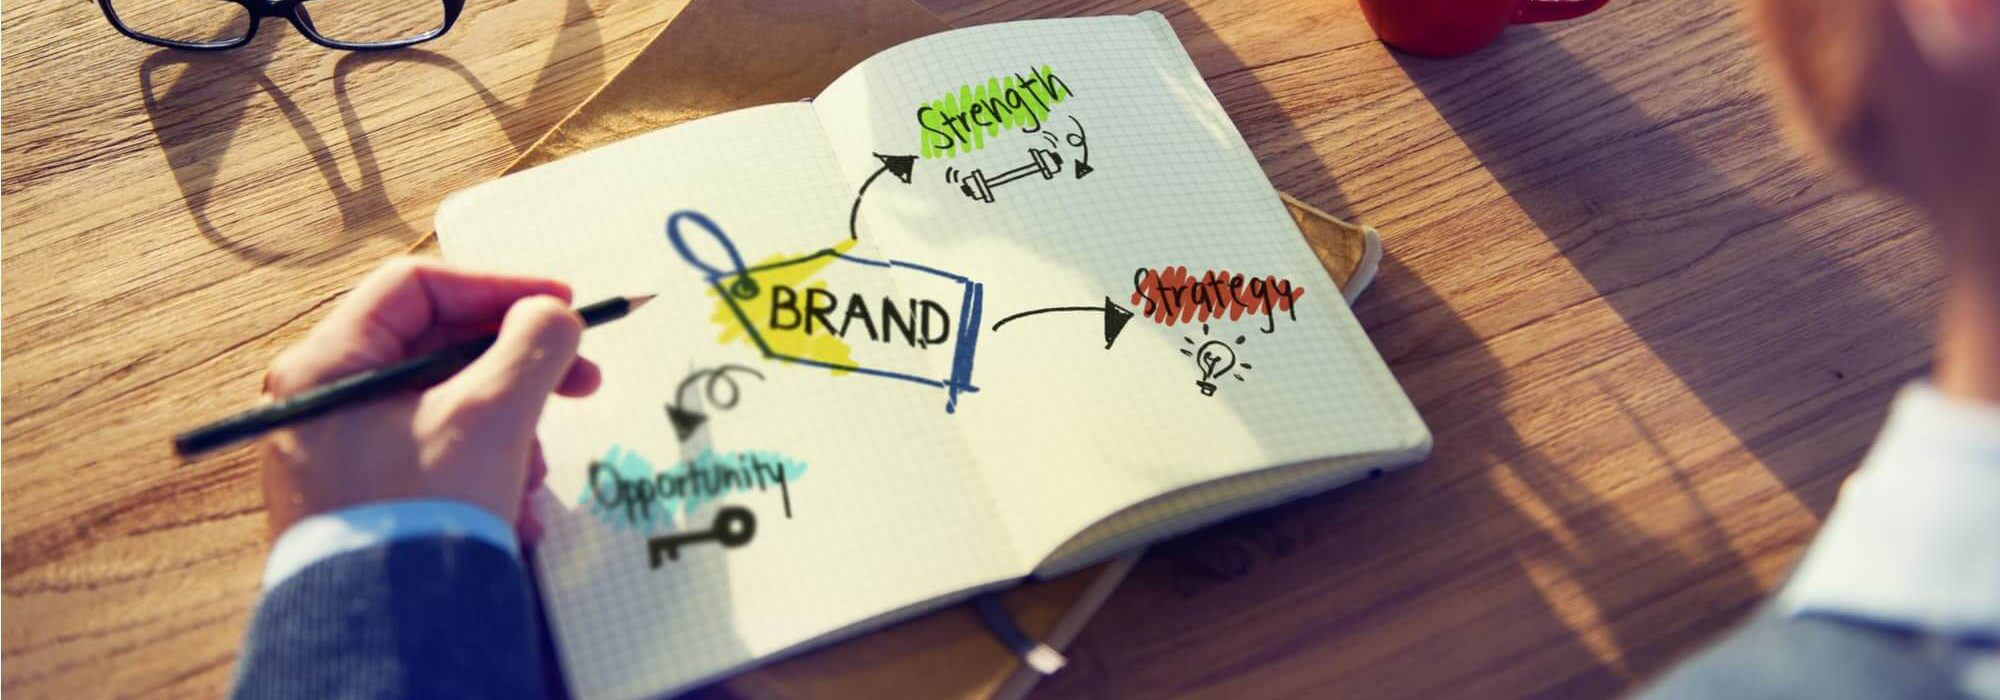 Branding and social media